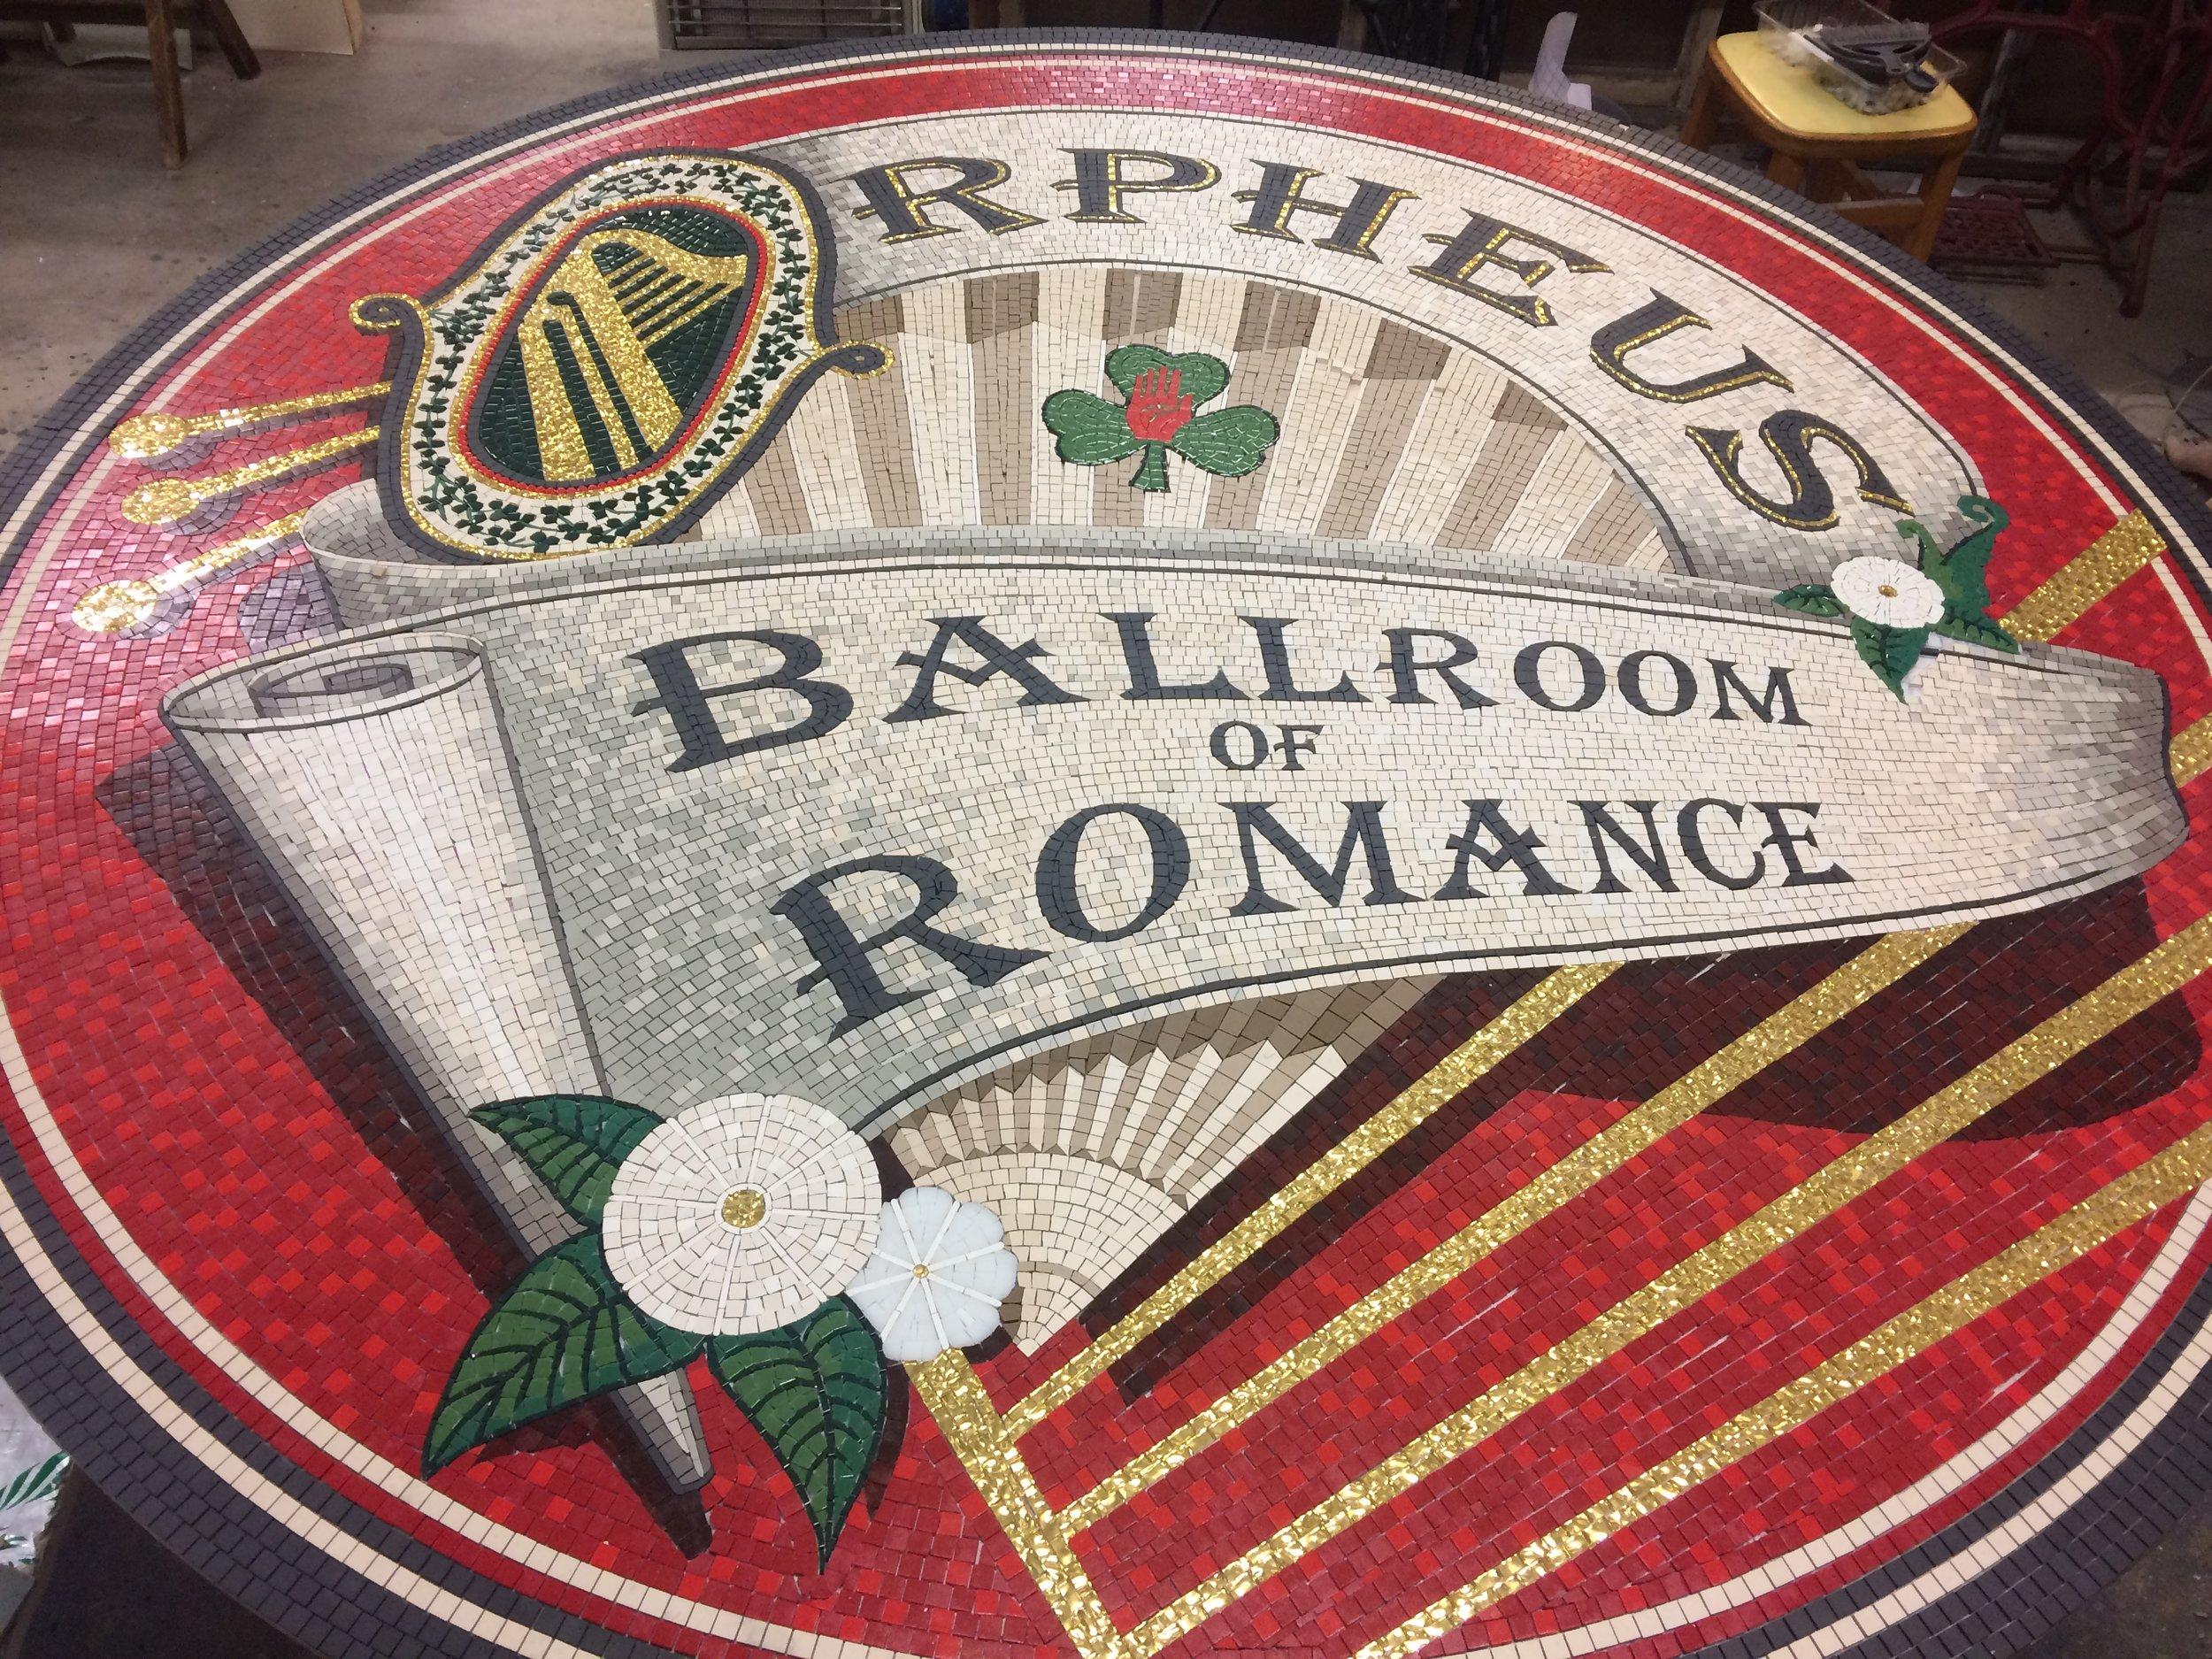 Ballroom of Romance.JPG